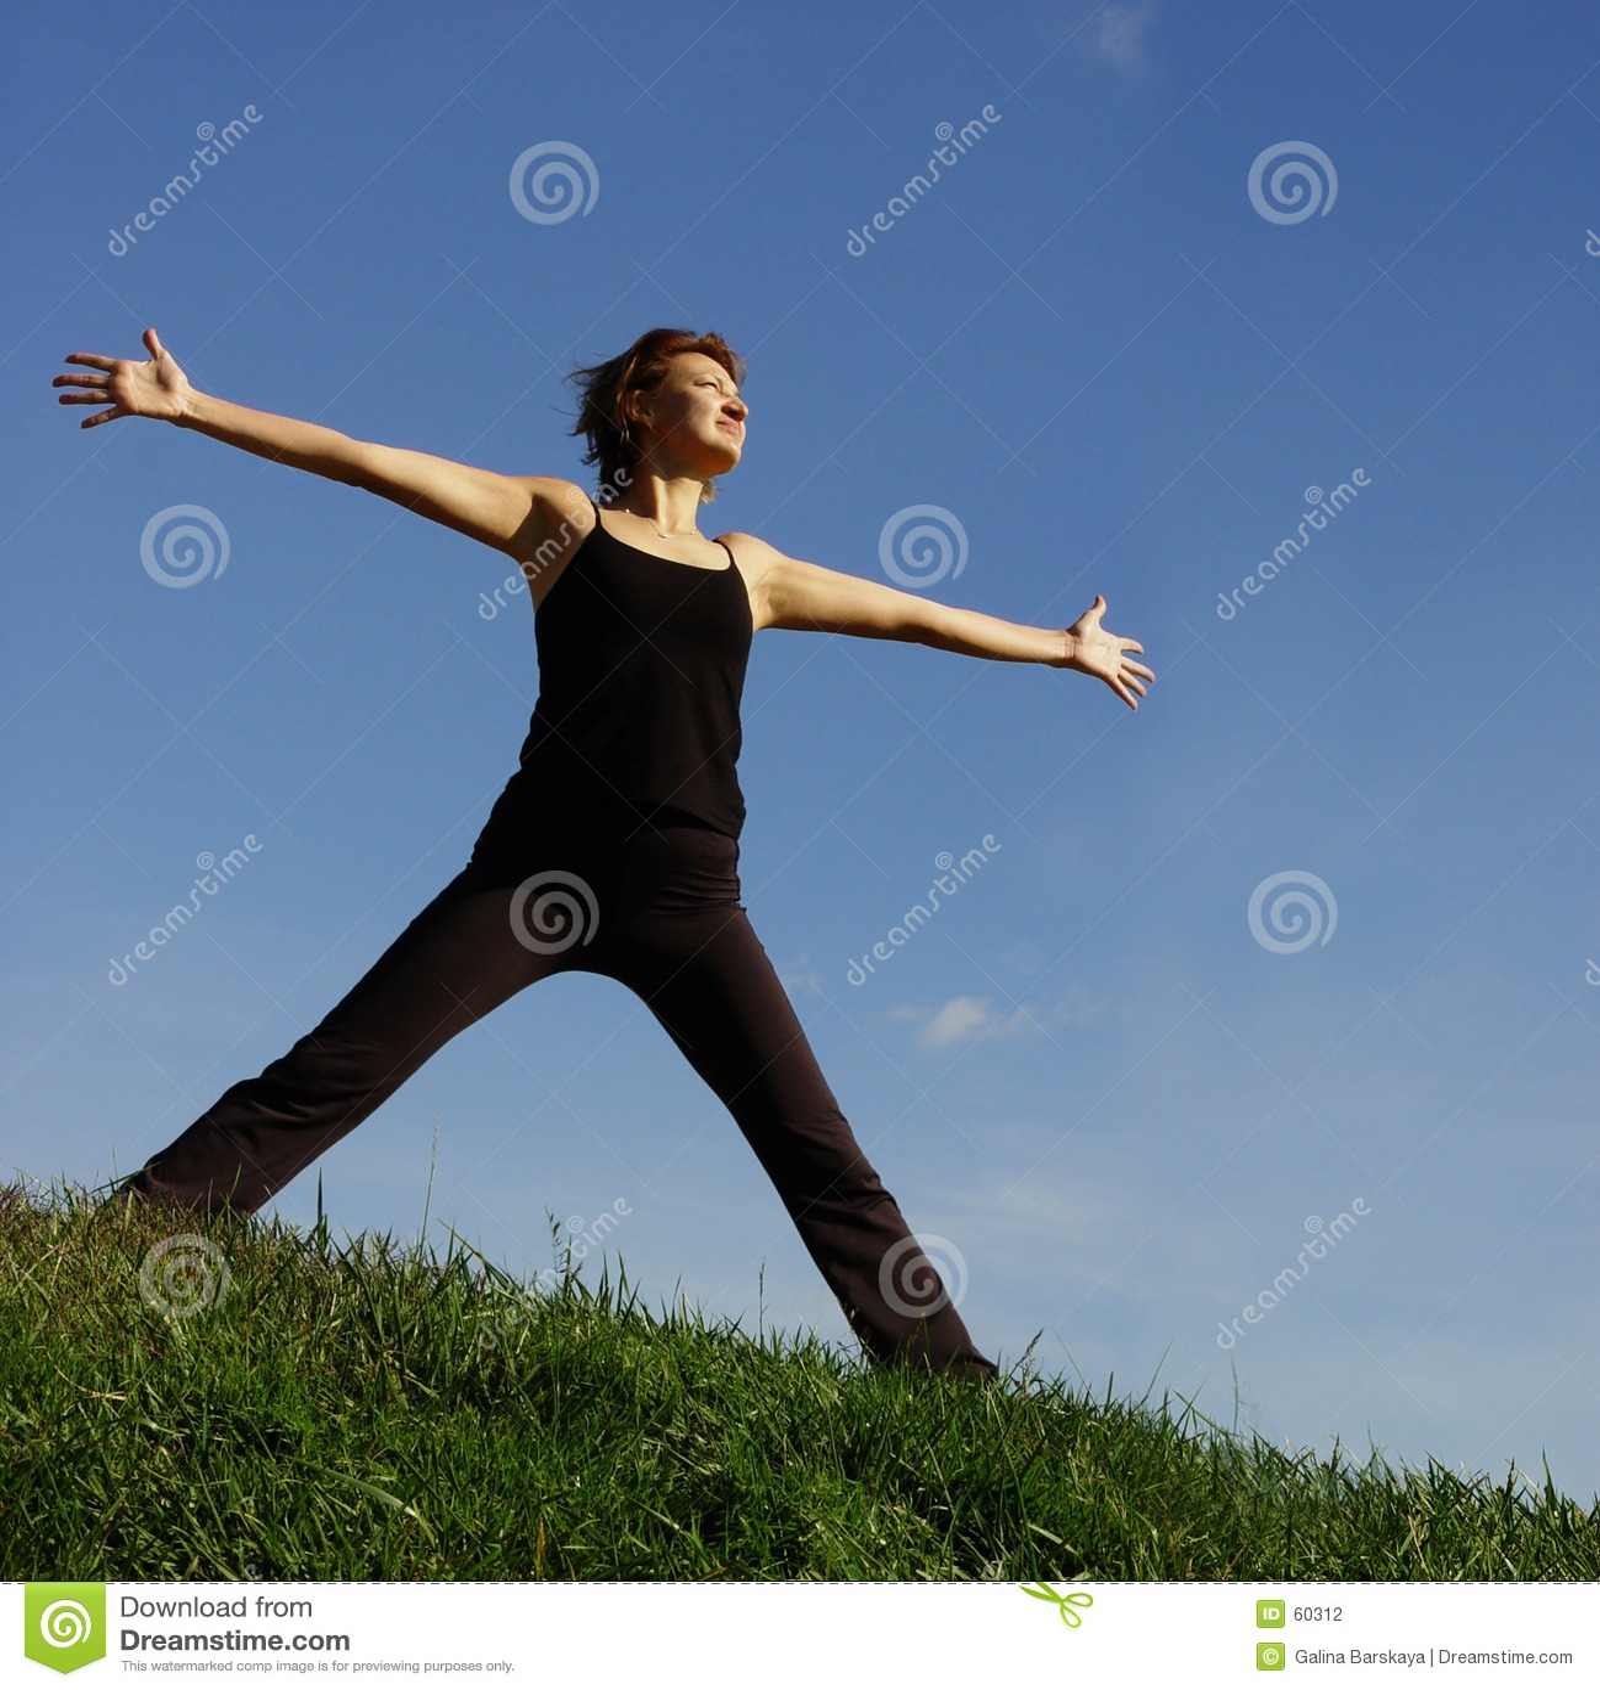 Download ευτυχία στοκ εικόνες. εικόνα από ισορροπία, διαβίωση, ενέργεια - 60312